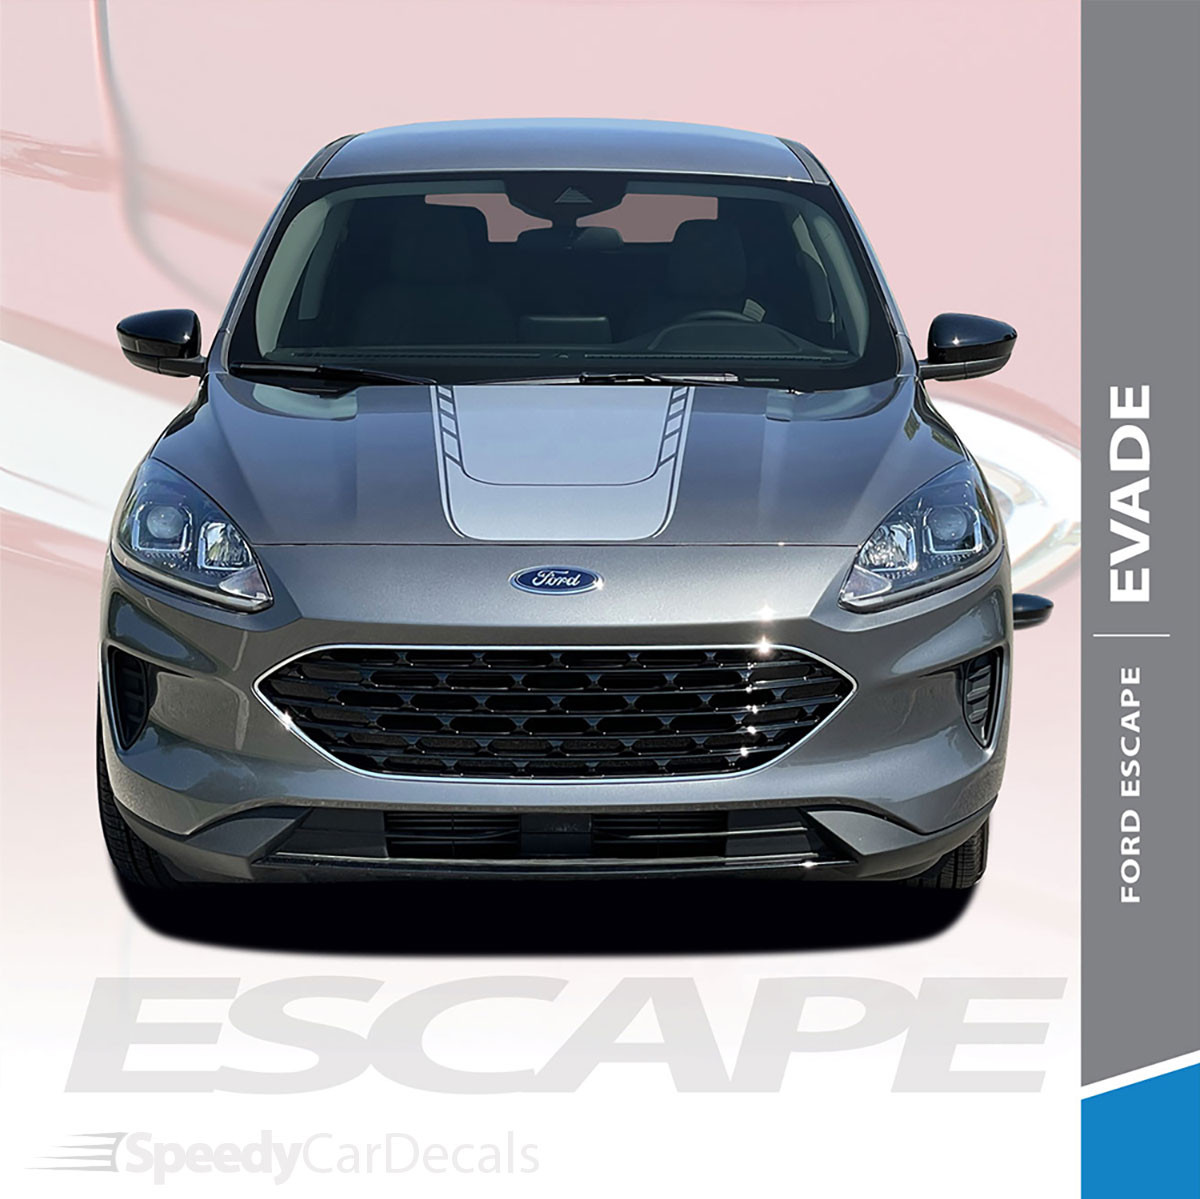 NEW! 2020 Ford Escape Hood Stripes EVADE HOOD 2020-2021